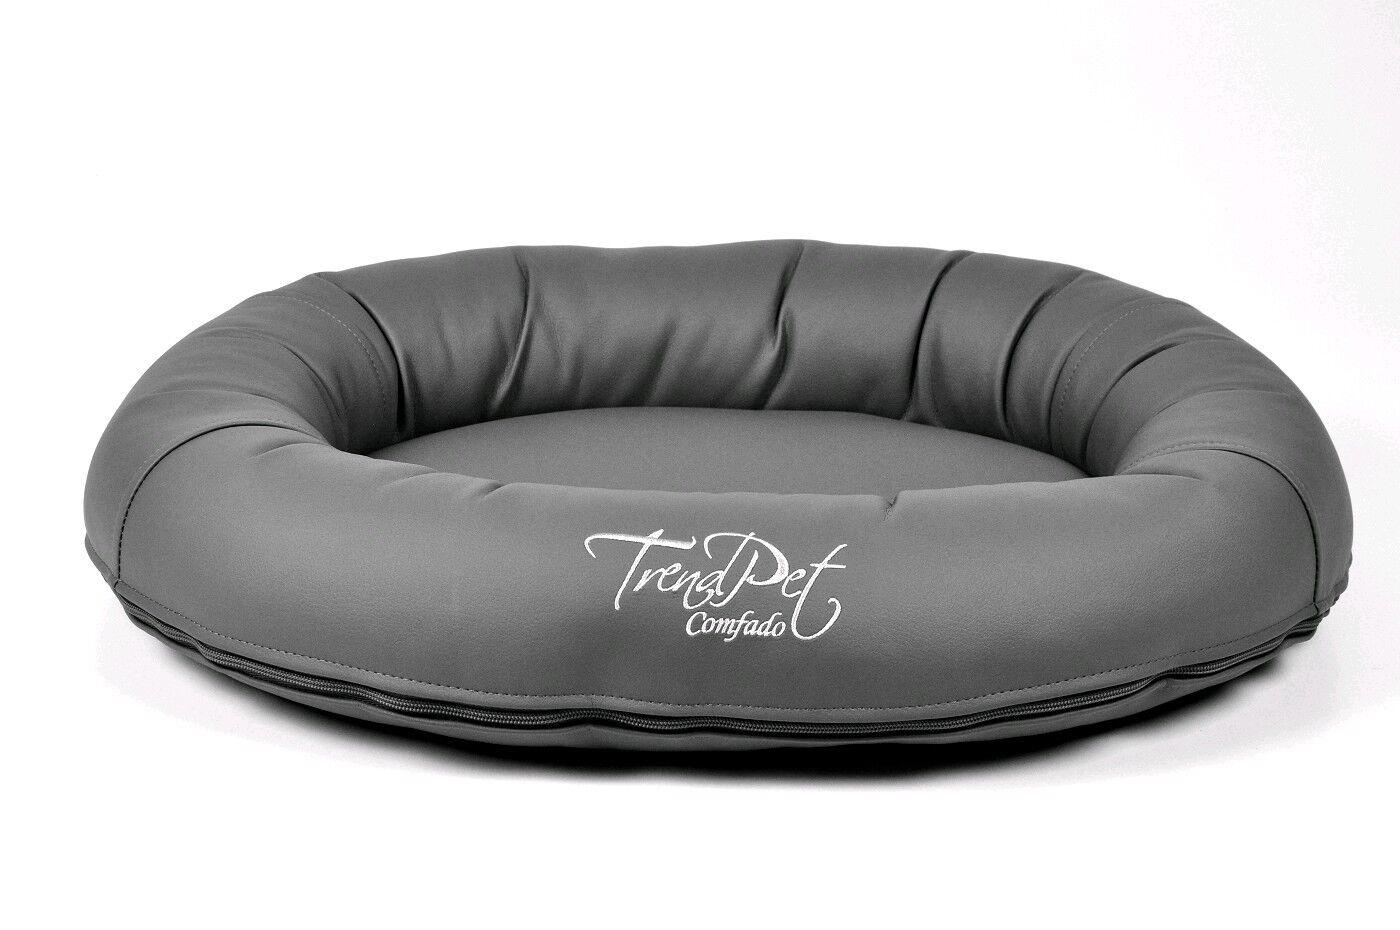 TrendPet Comfado 130x90cm Elephant Soft Kunstleder Hundebett Hundekorb Hundekorb Hundekorb 1fb182